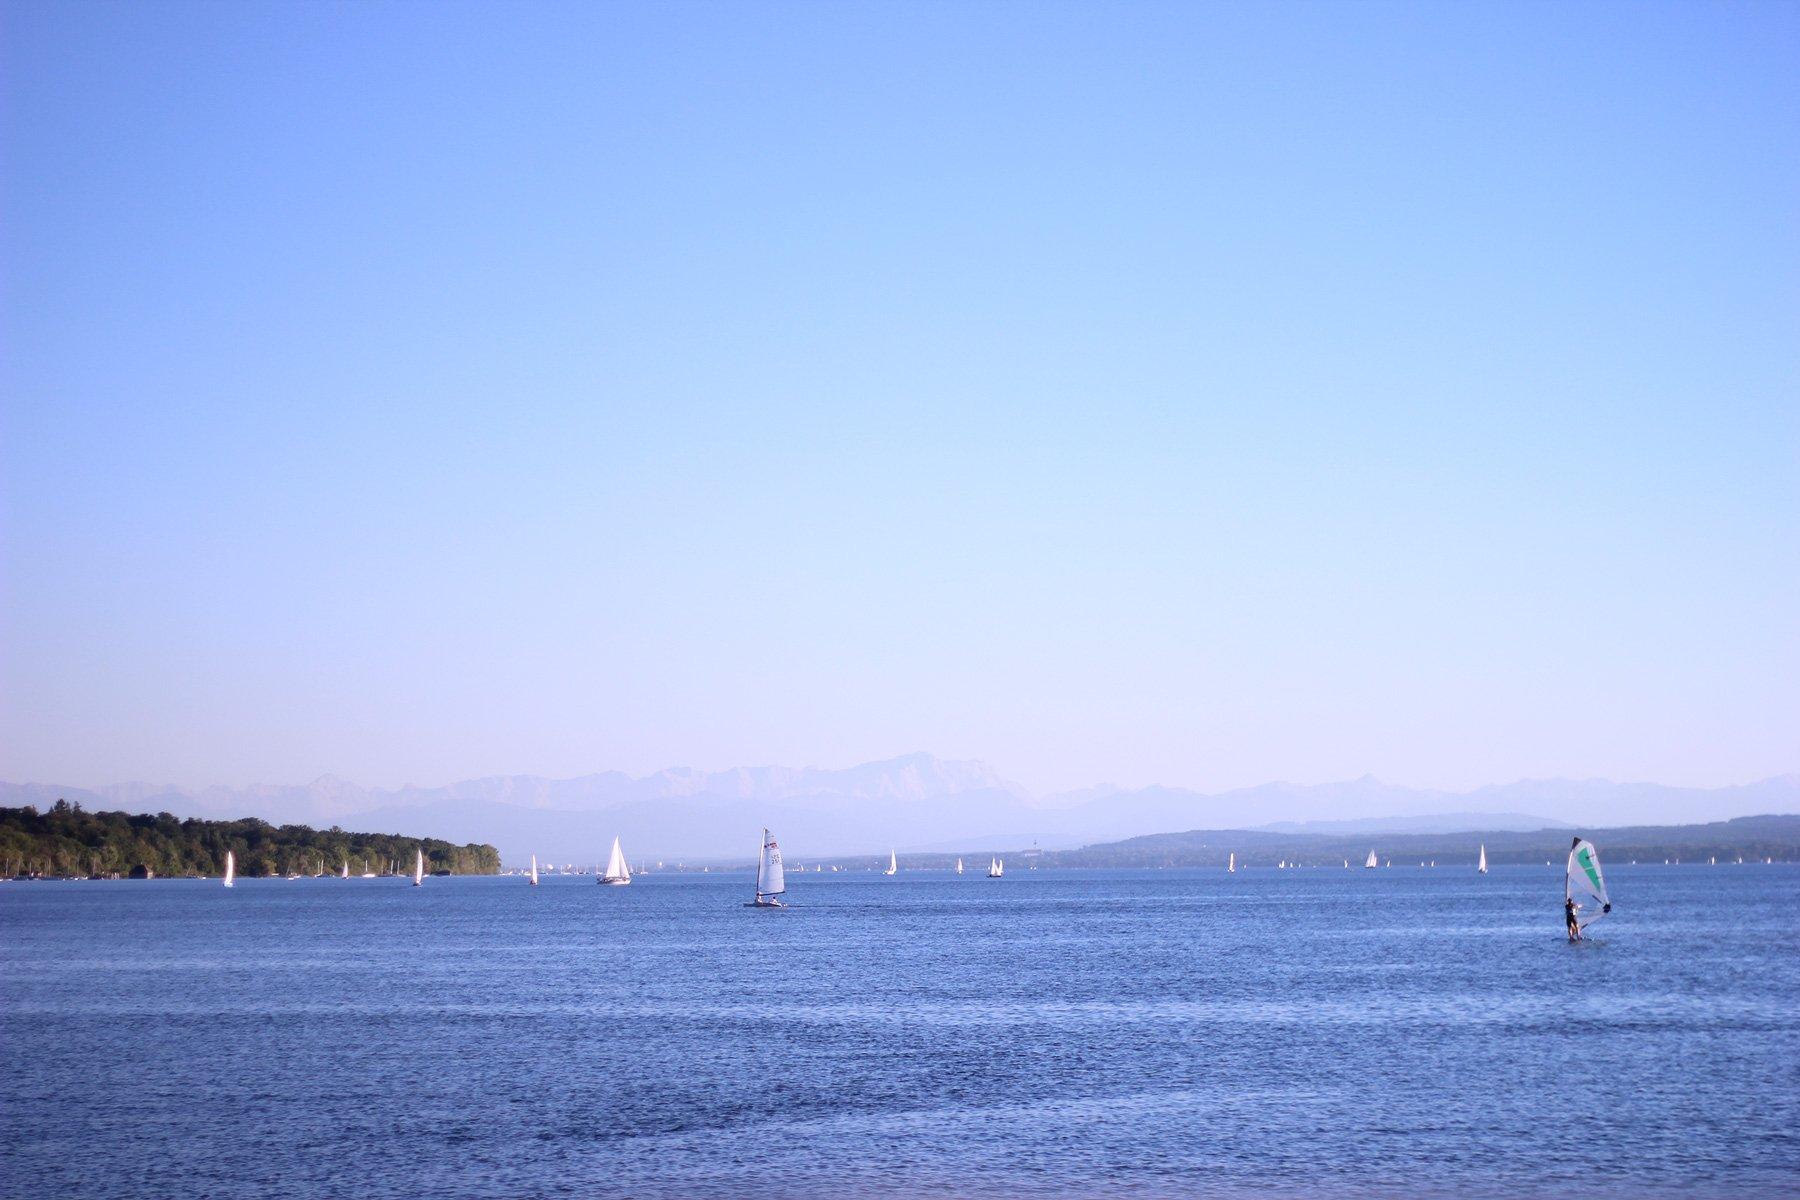 Ammersee, Lake, Sommer, Summerfeeling, Natur